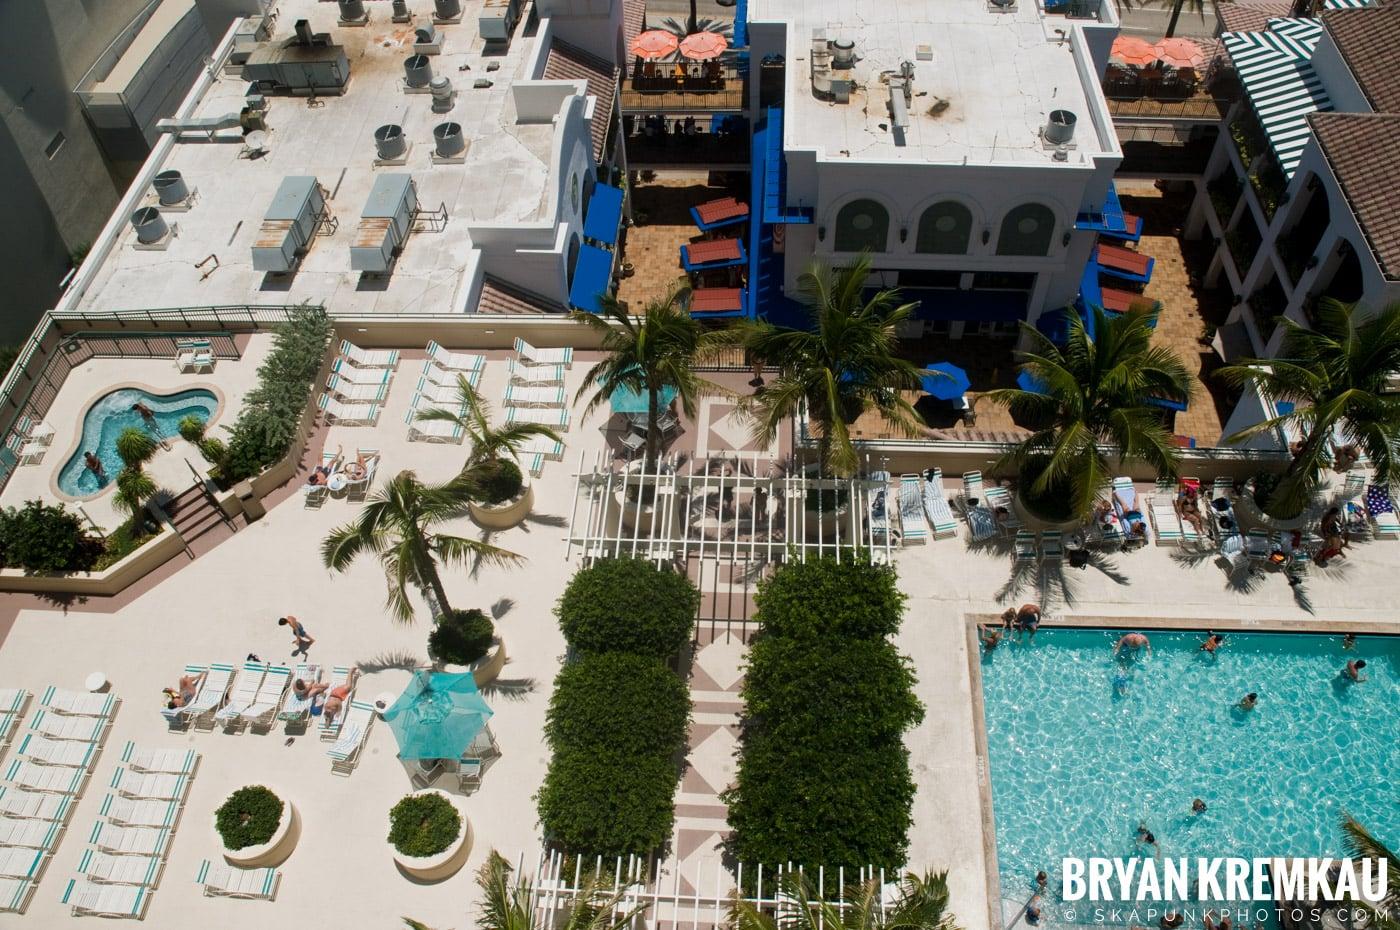 Florida Keys Vacation - 7.09.10 - 7.15.10 (109)